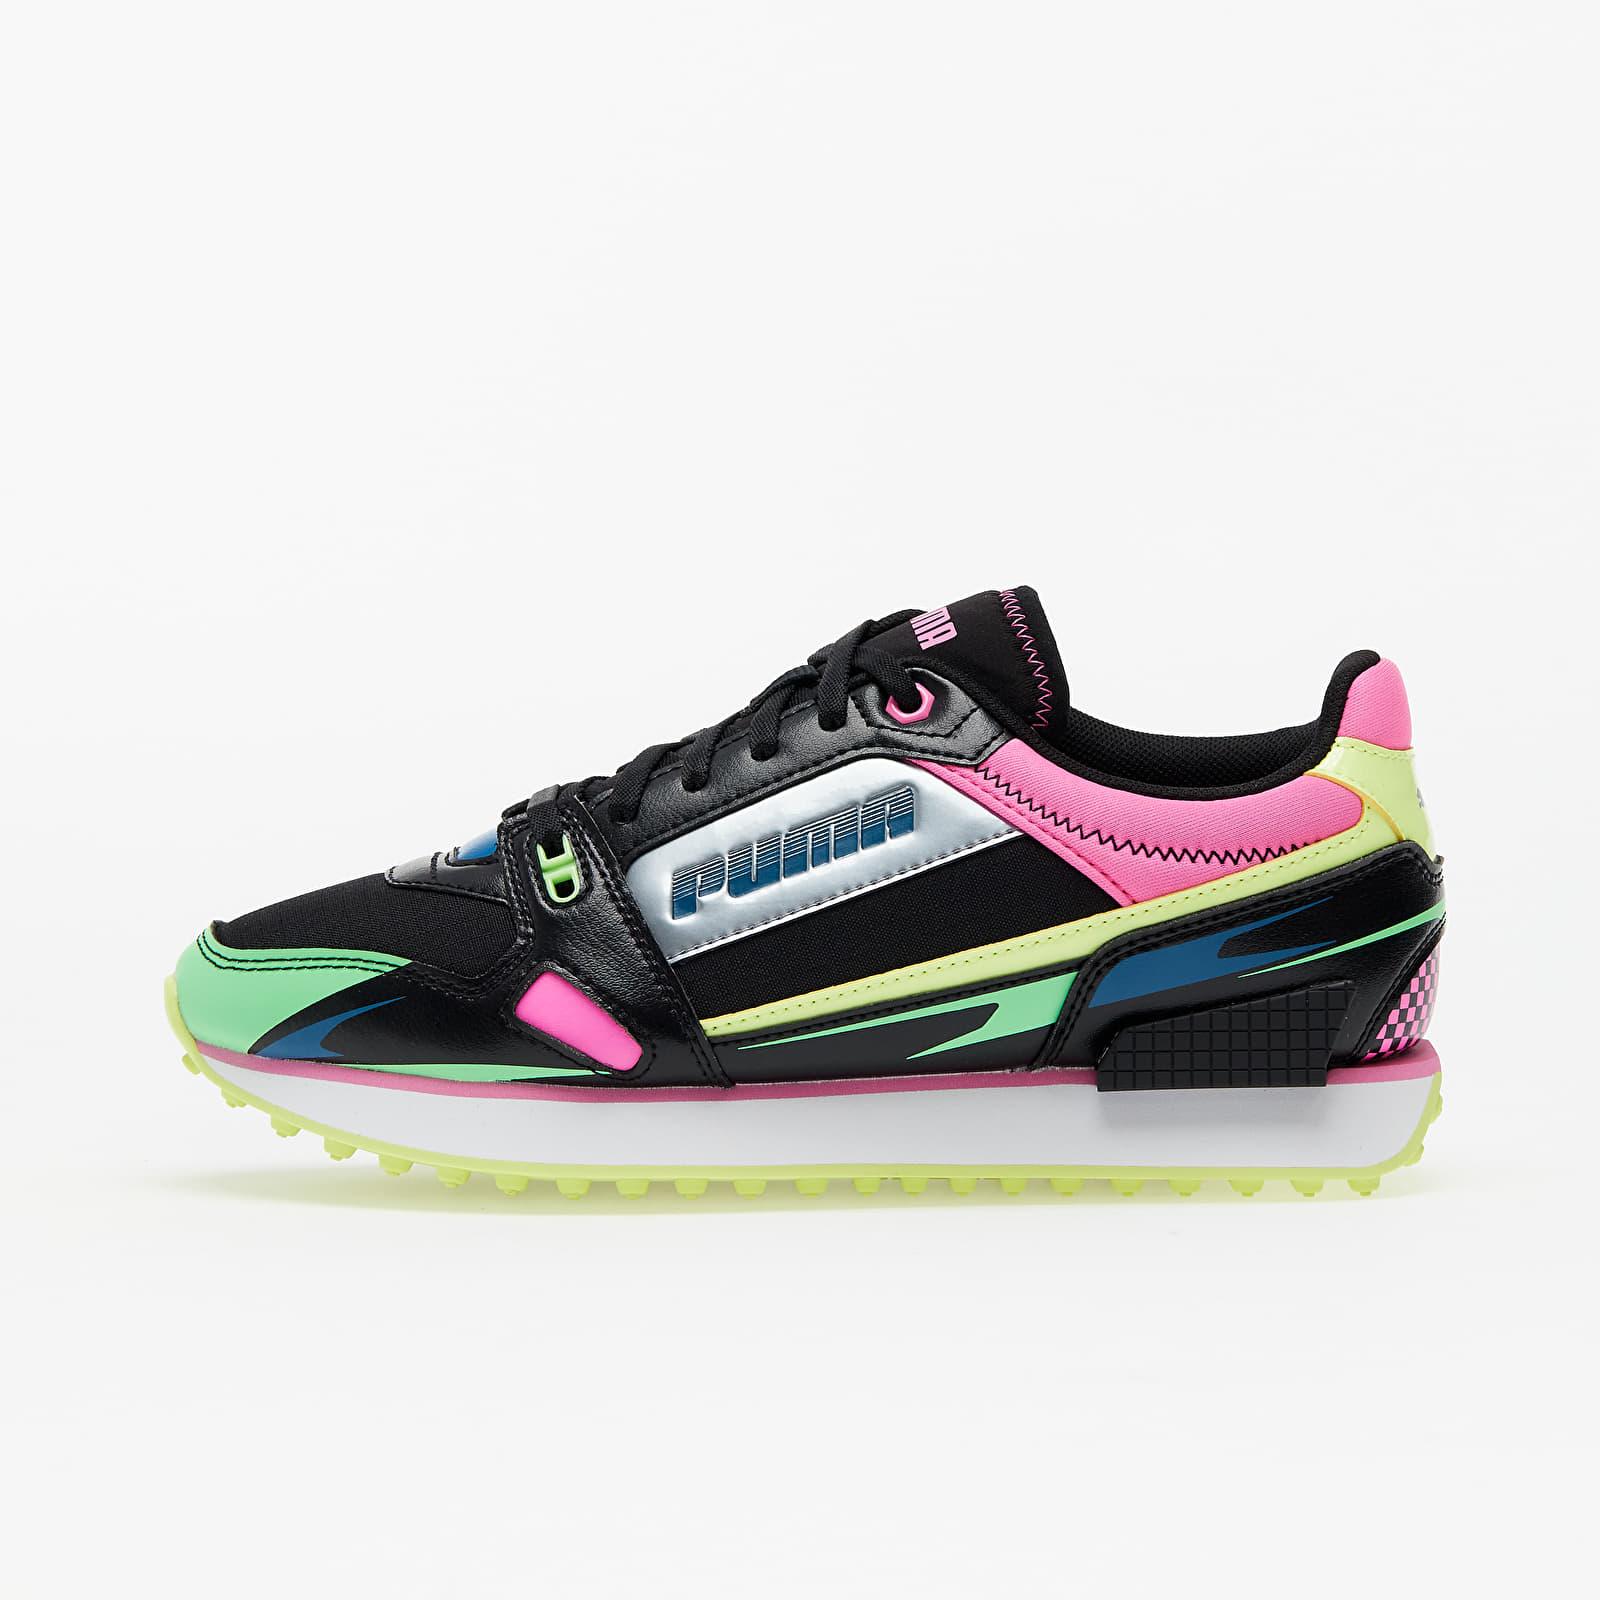 Dámske topánky a tenisky Puma Mile Rider Sunny Gataway Wns Puma Black-Elektro Green